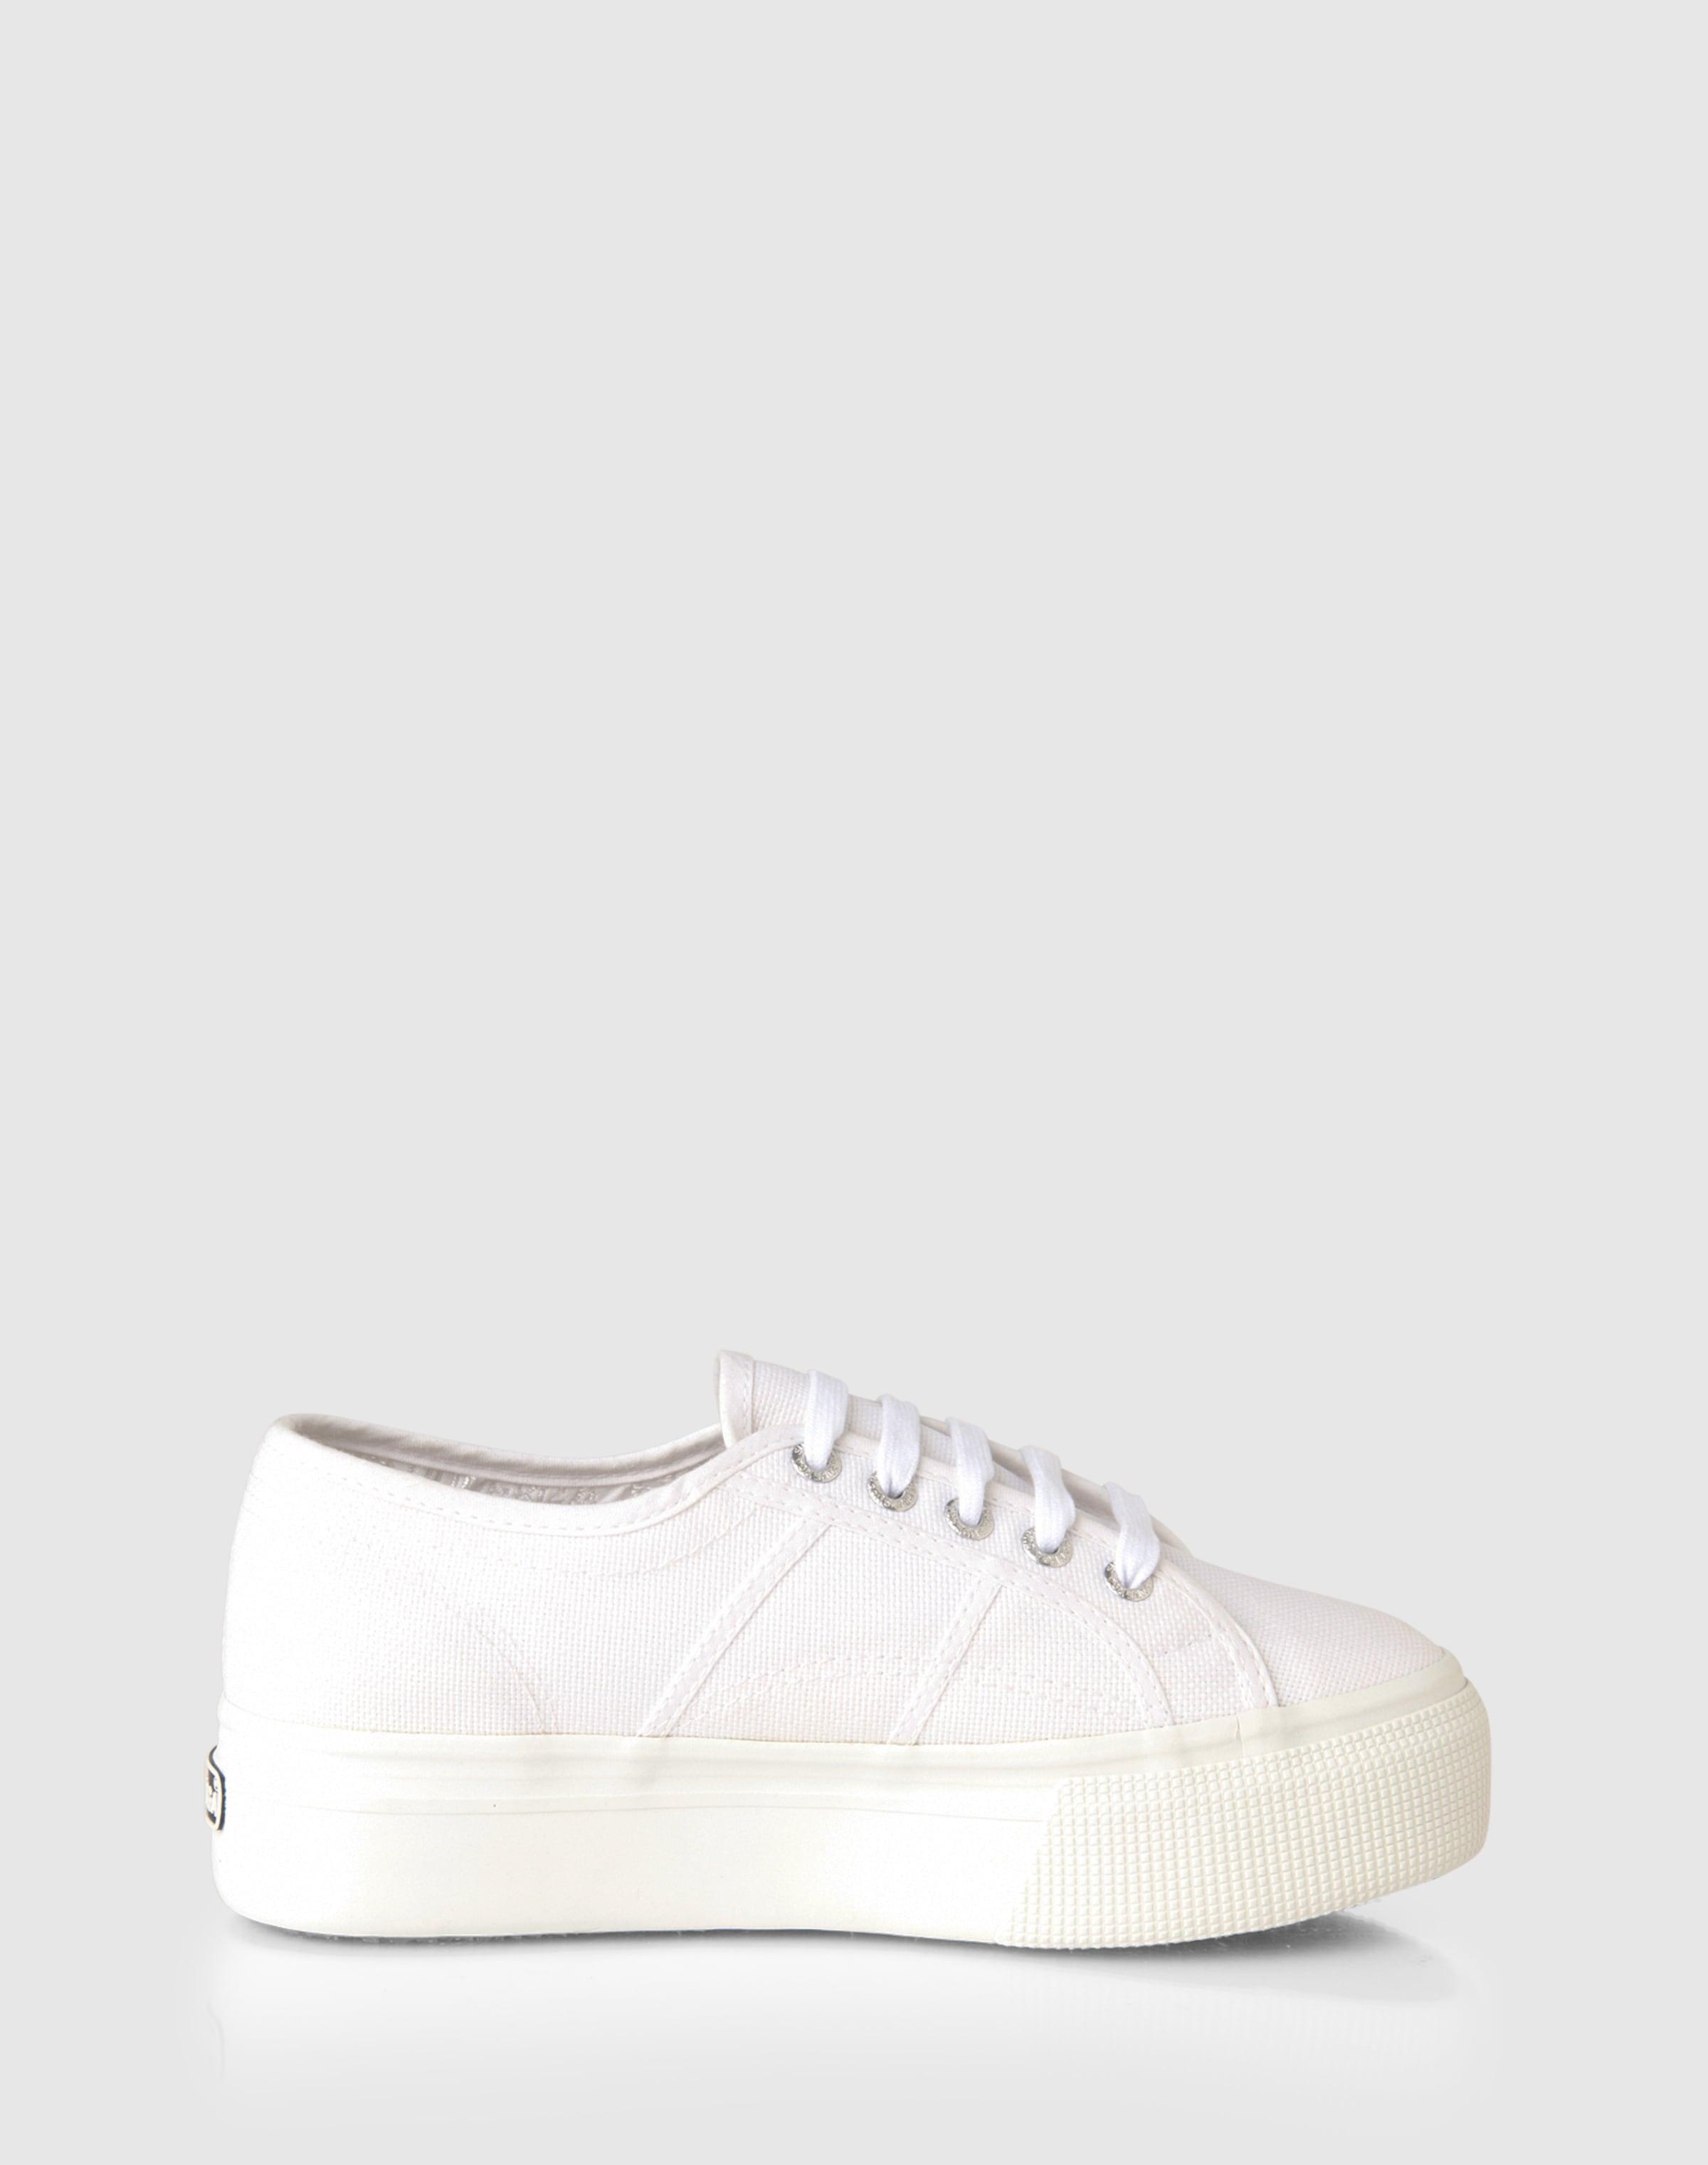 SUPERGA Sneaker '2790 Acotw Linea Up & down' Brandneues Unisex Günstiger Preis ob6vwk